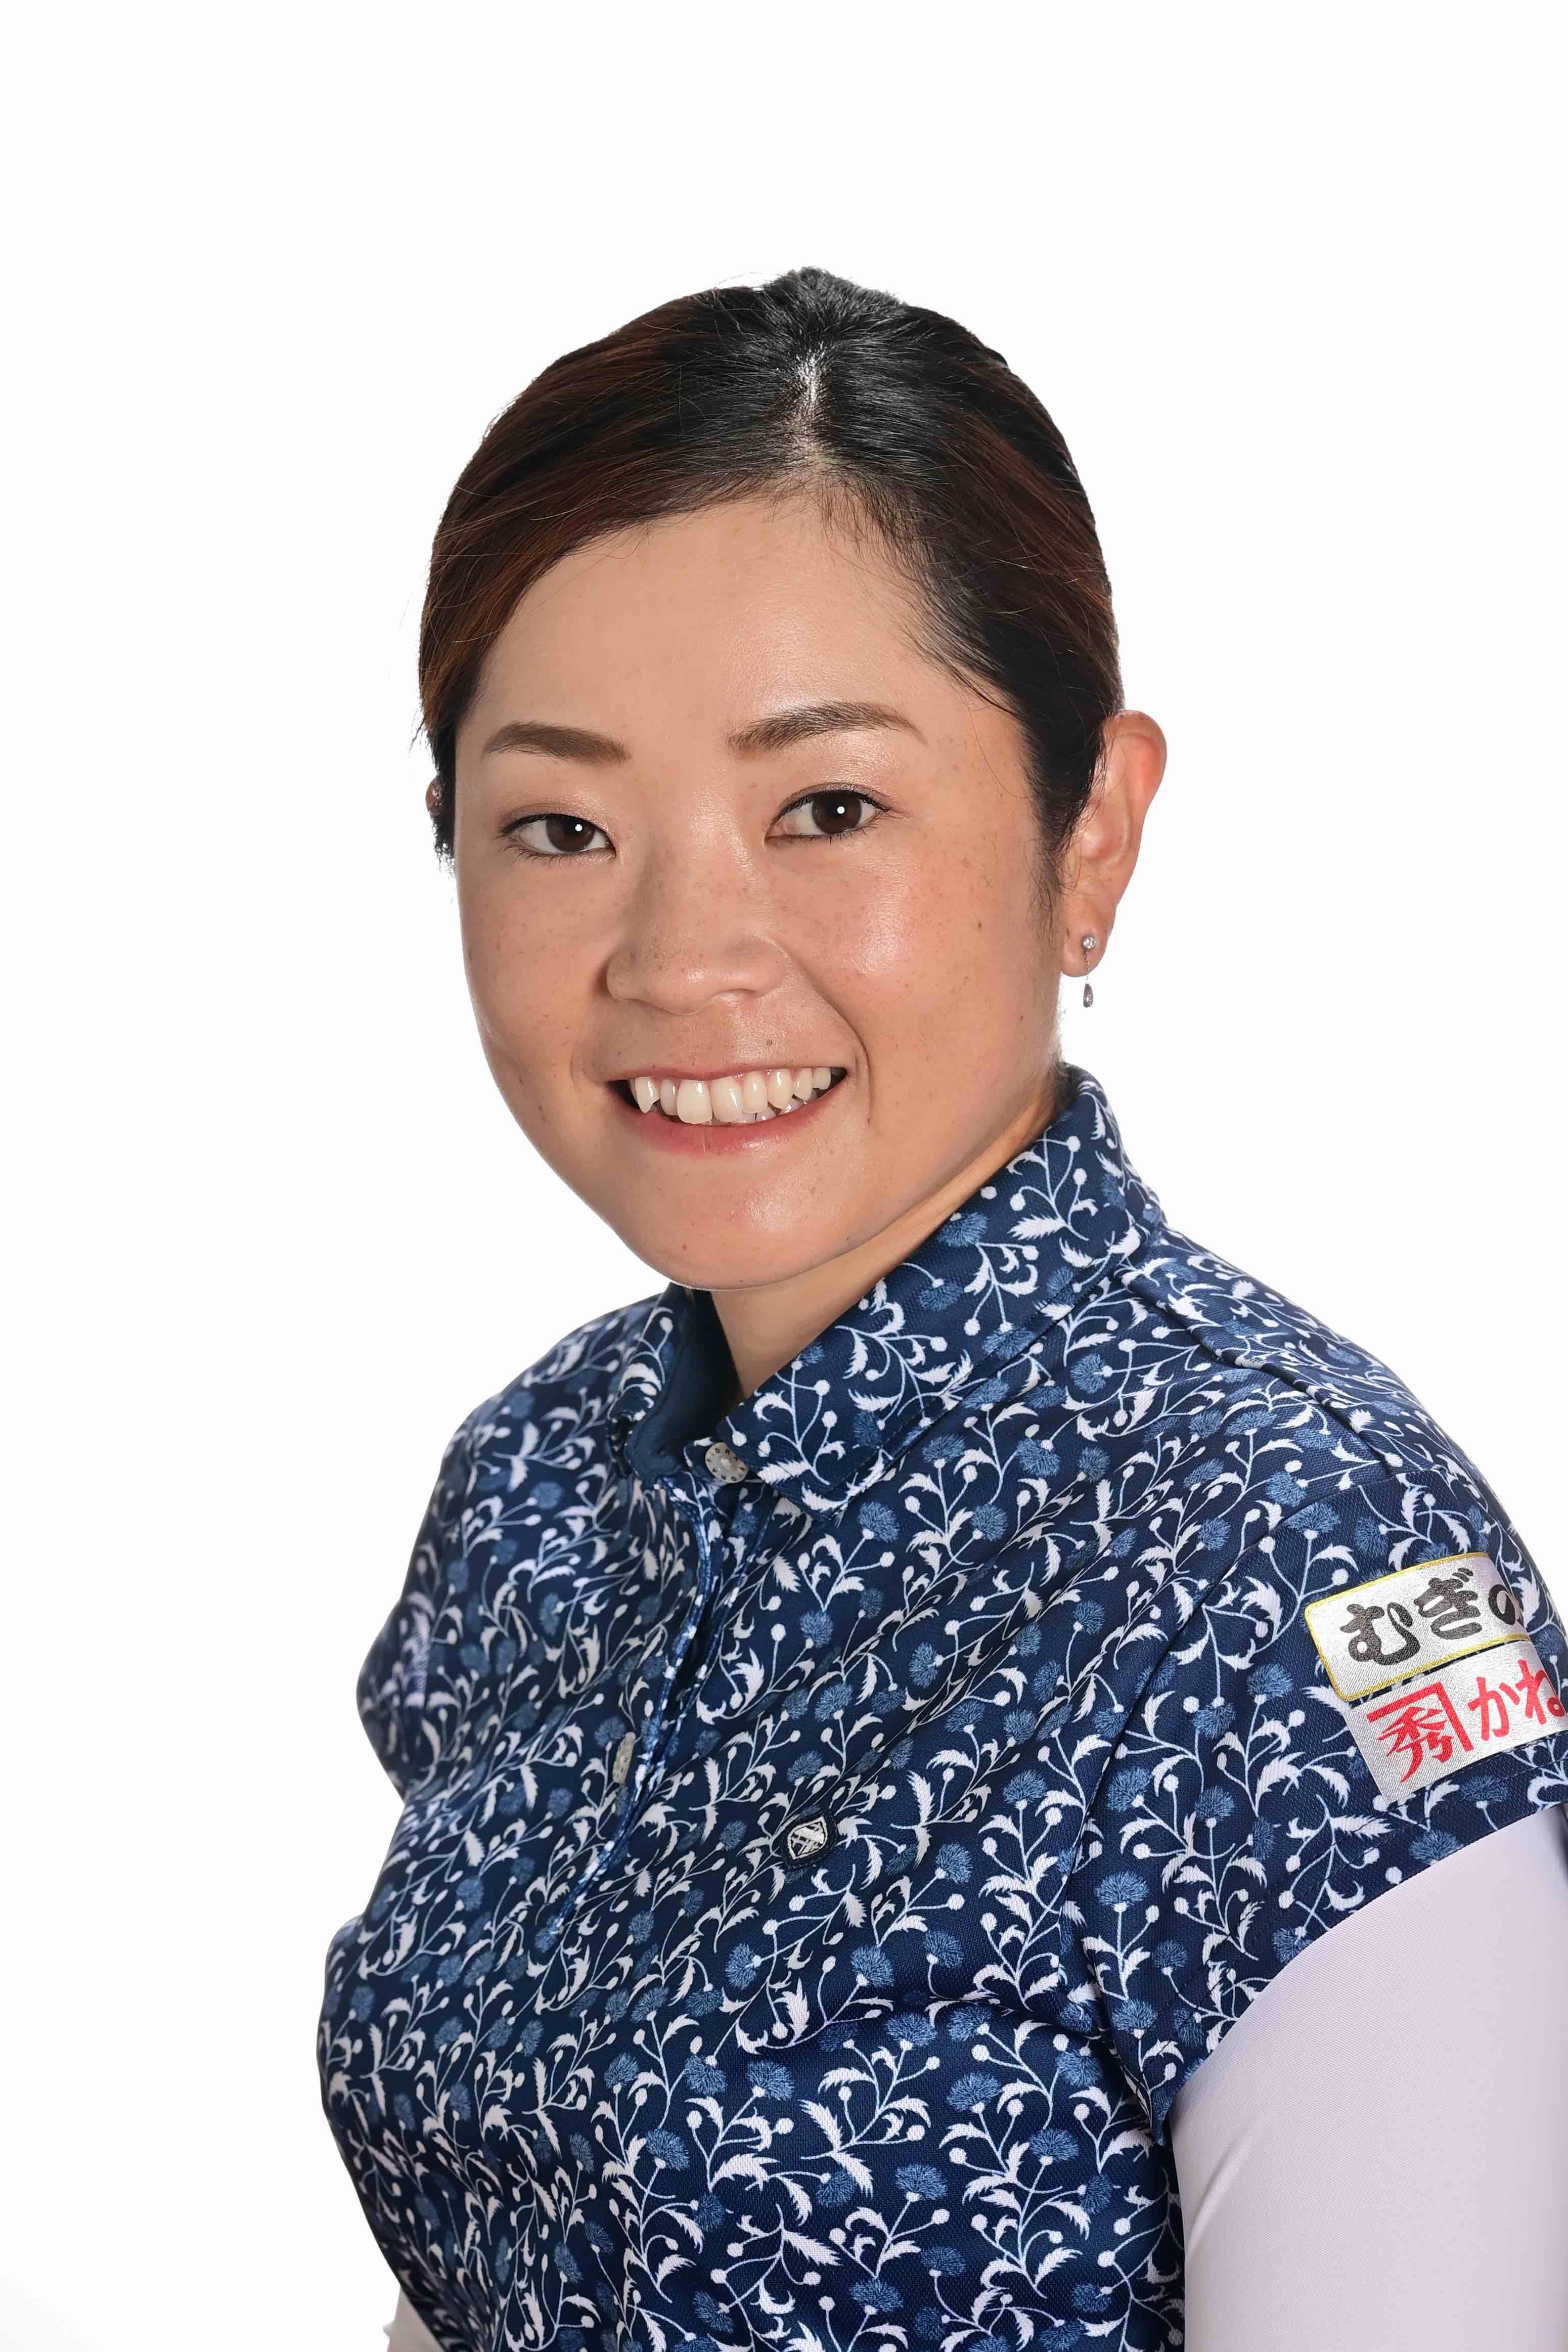 【JLPGA公式】仲宗根 澄香 選手(ゴルフボール1スリーブ②)